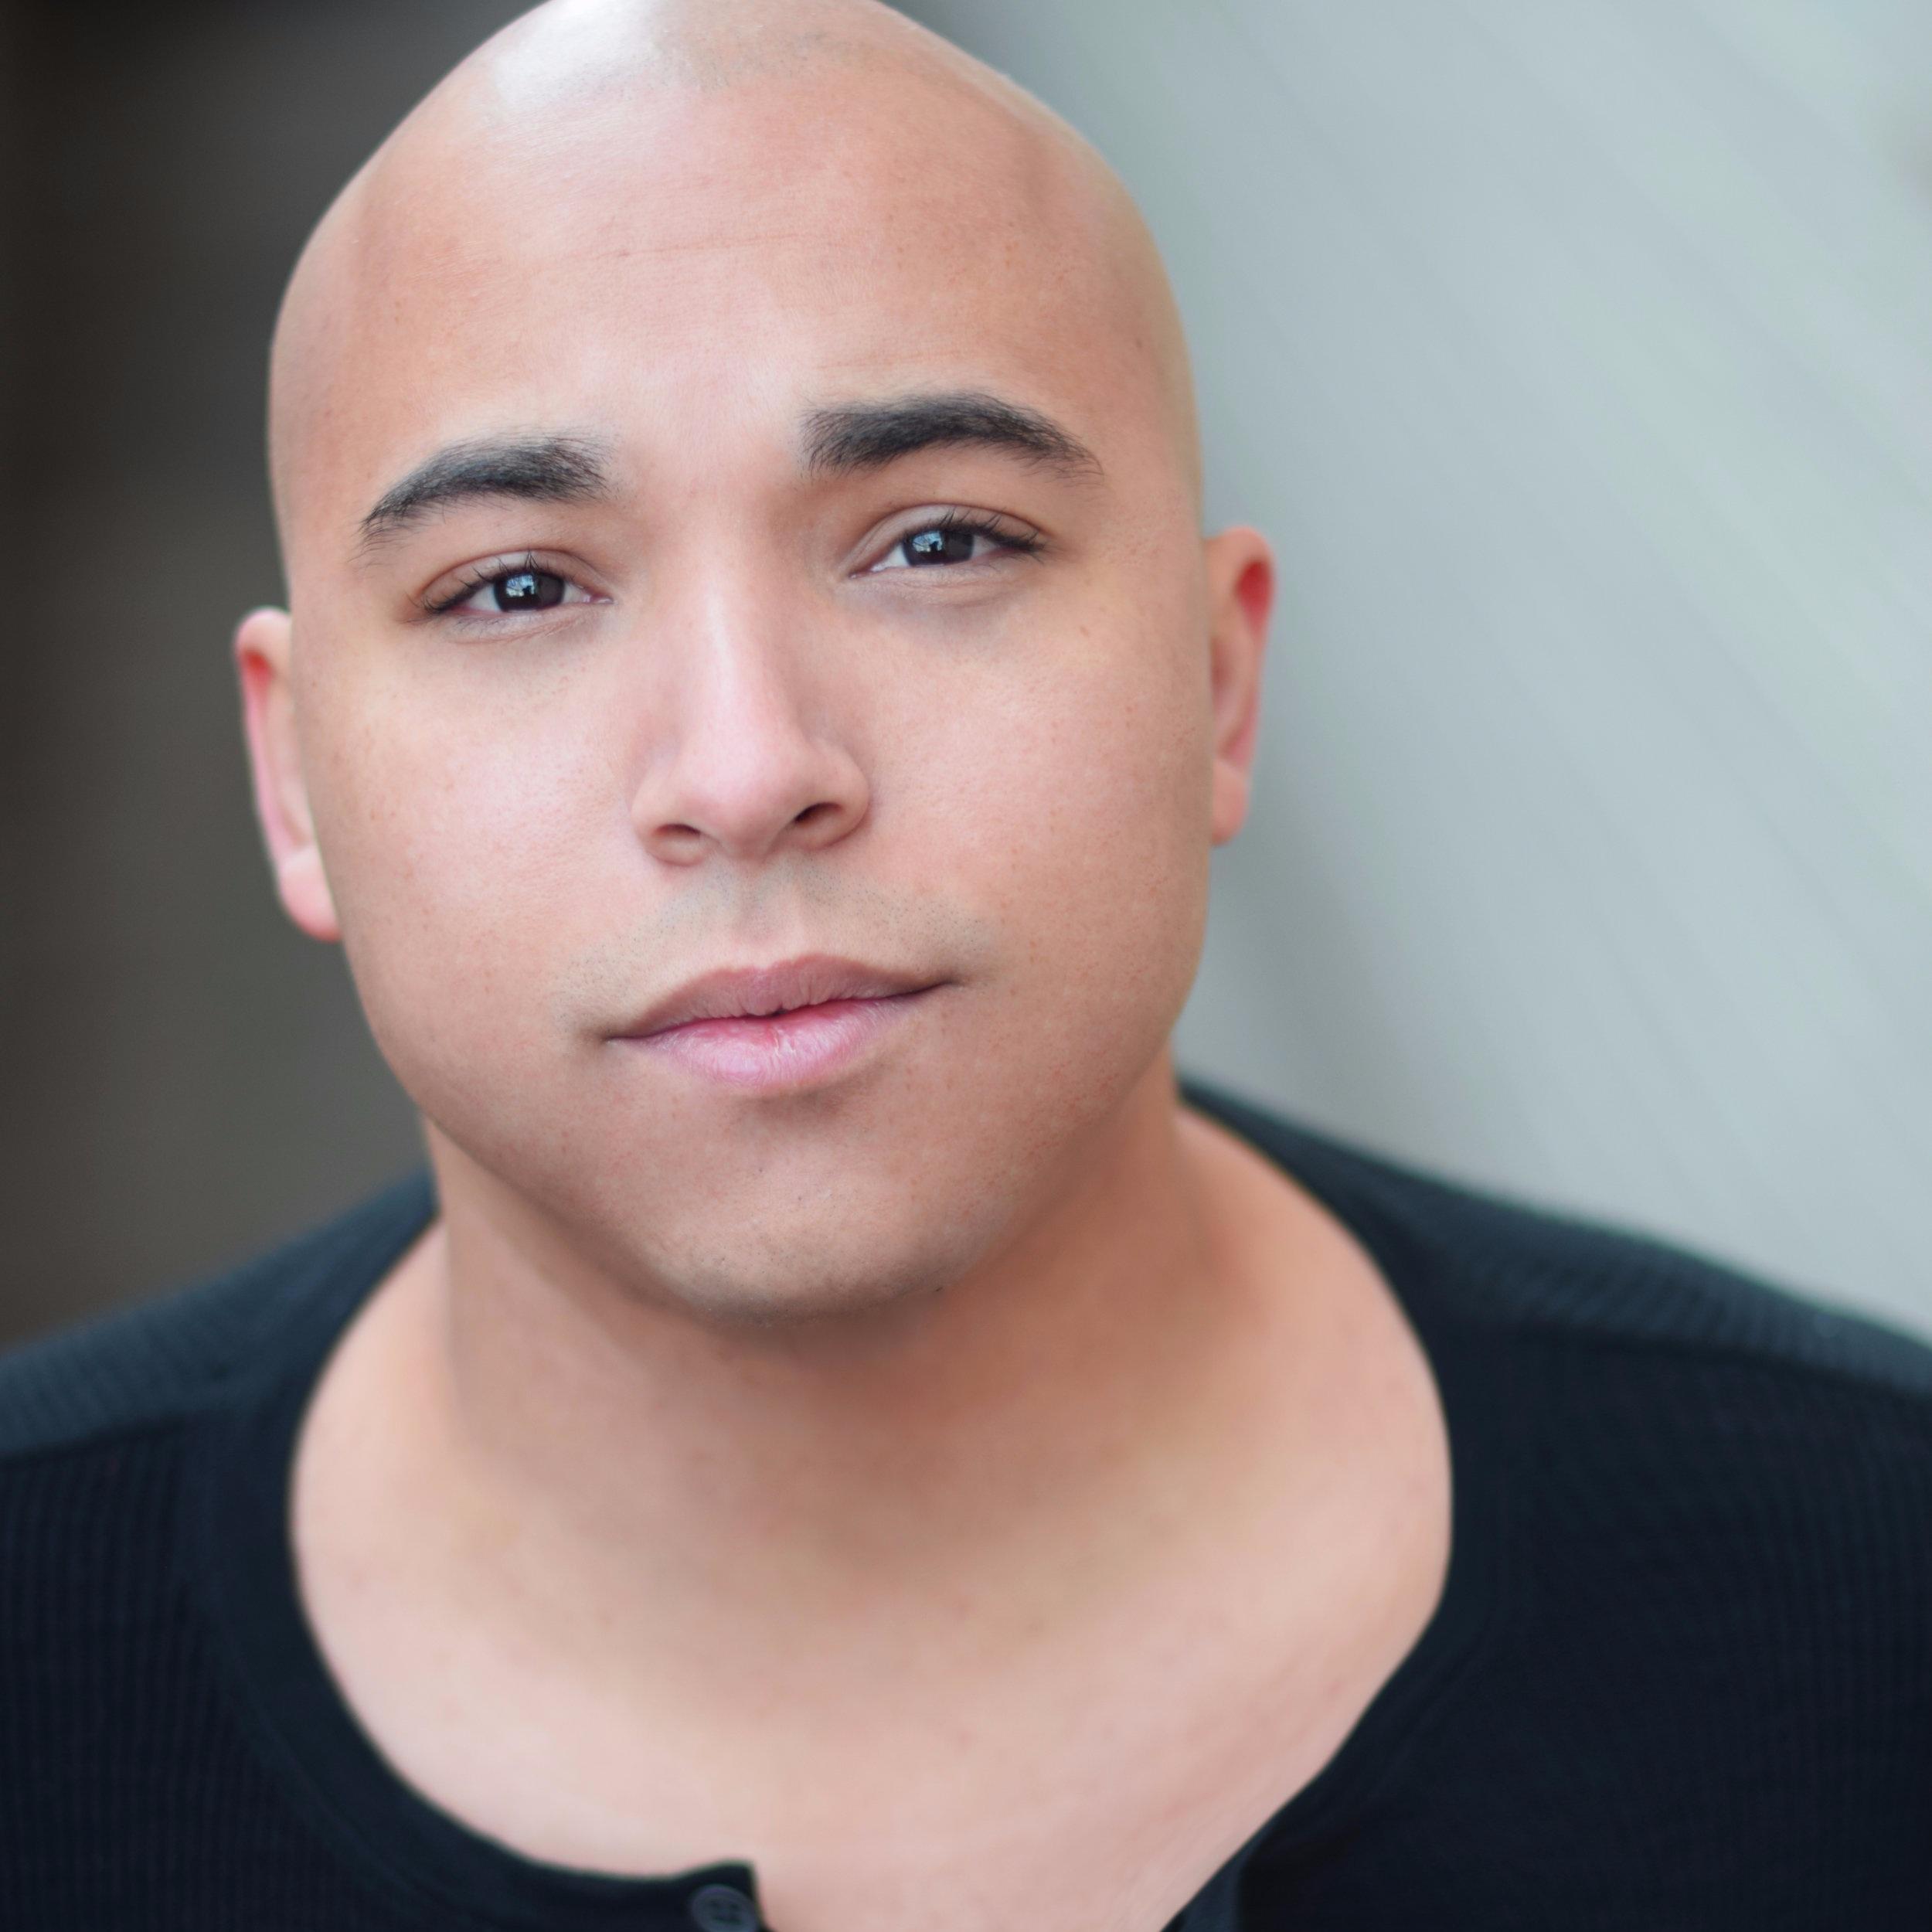 Christopher Alexey Diaz* - Banquo/Siward